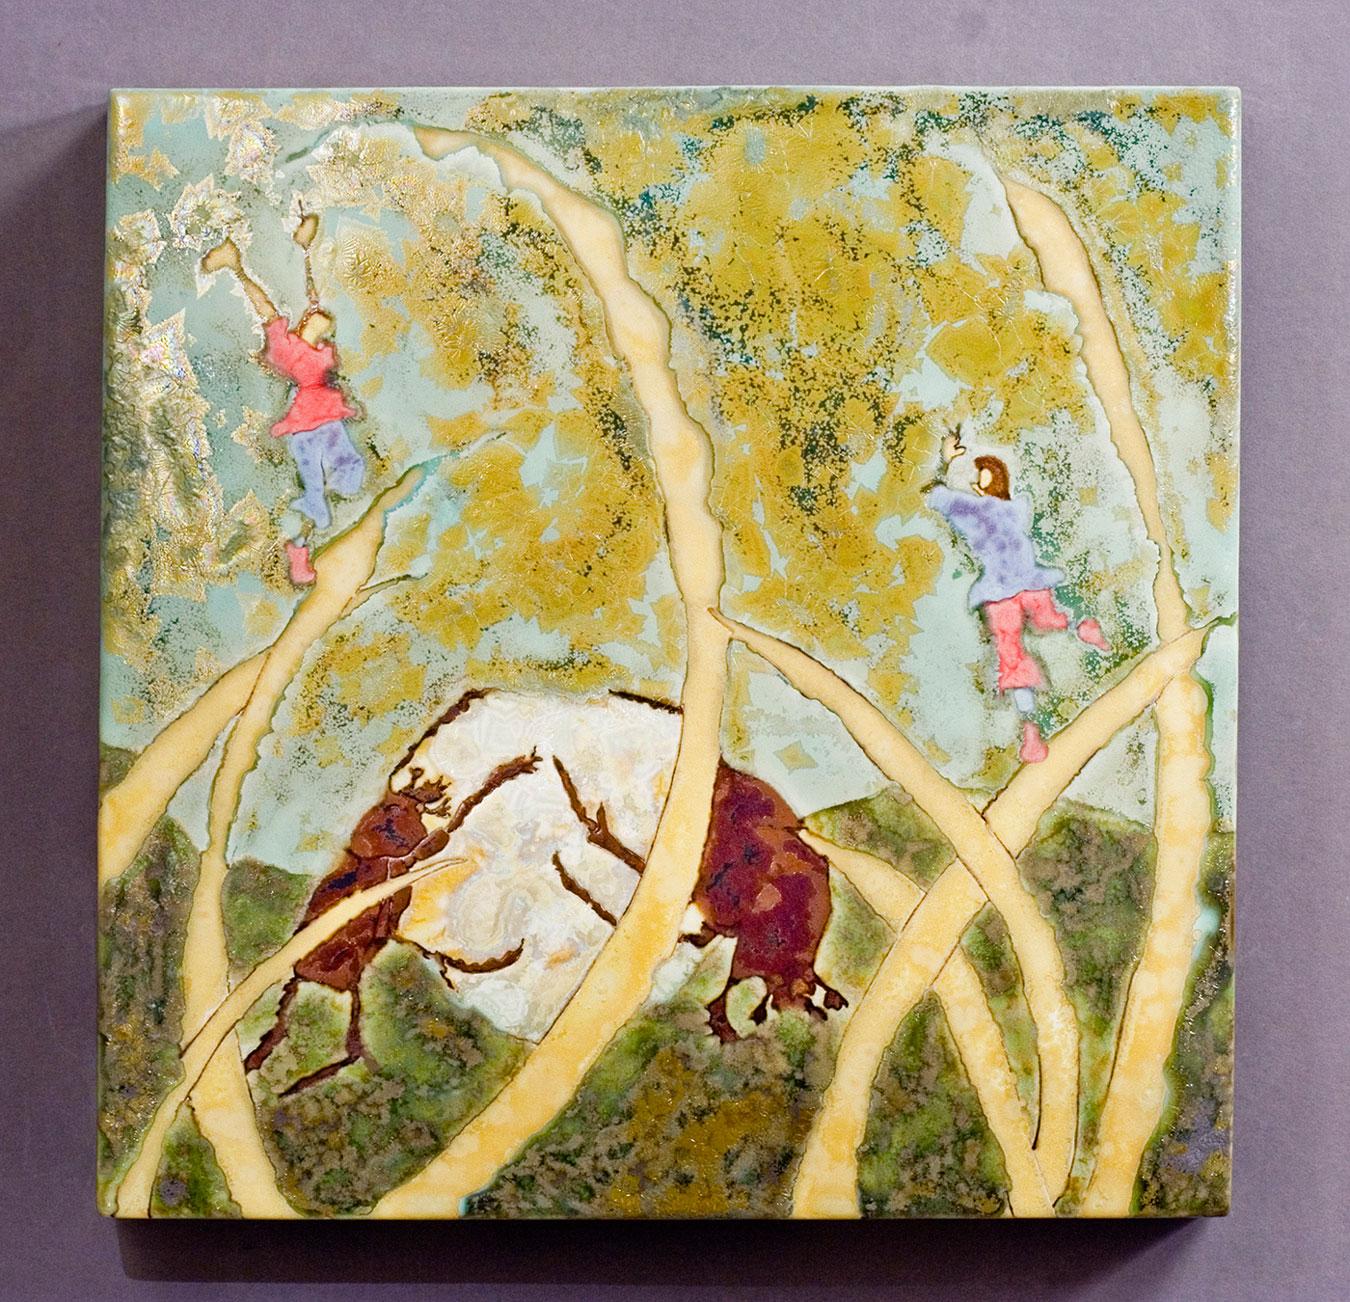 Tumblers-Rollers-Dwellers-Ceramic-Art-Painting-Bulldog-Pottery.jpg